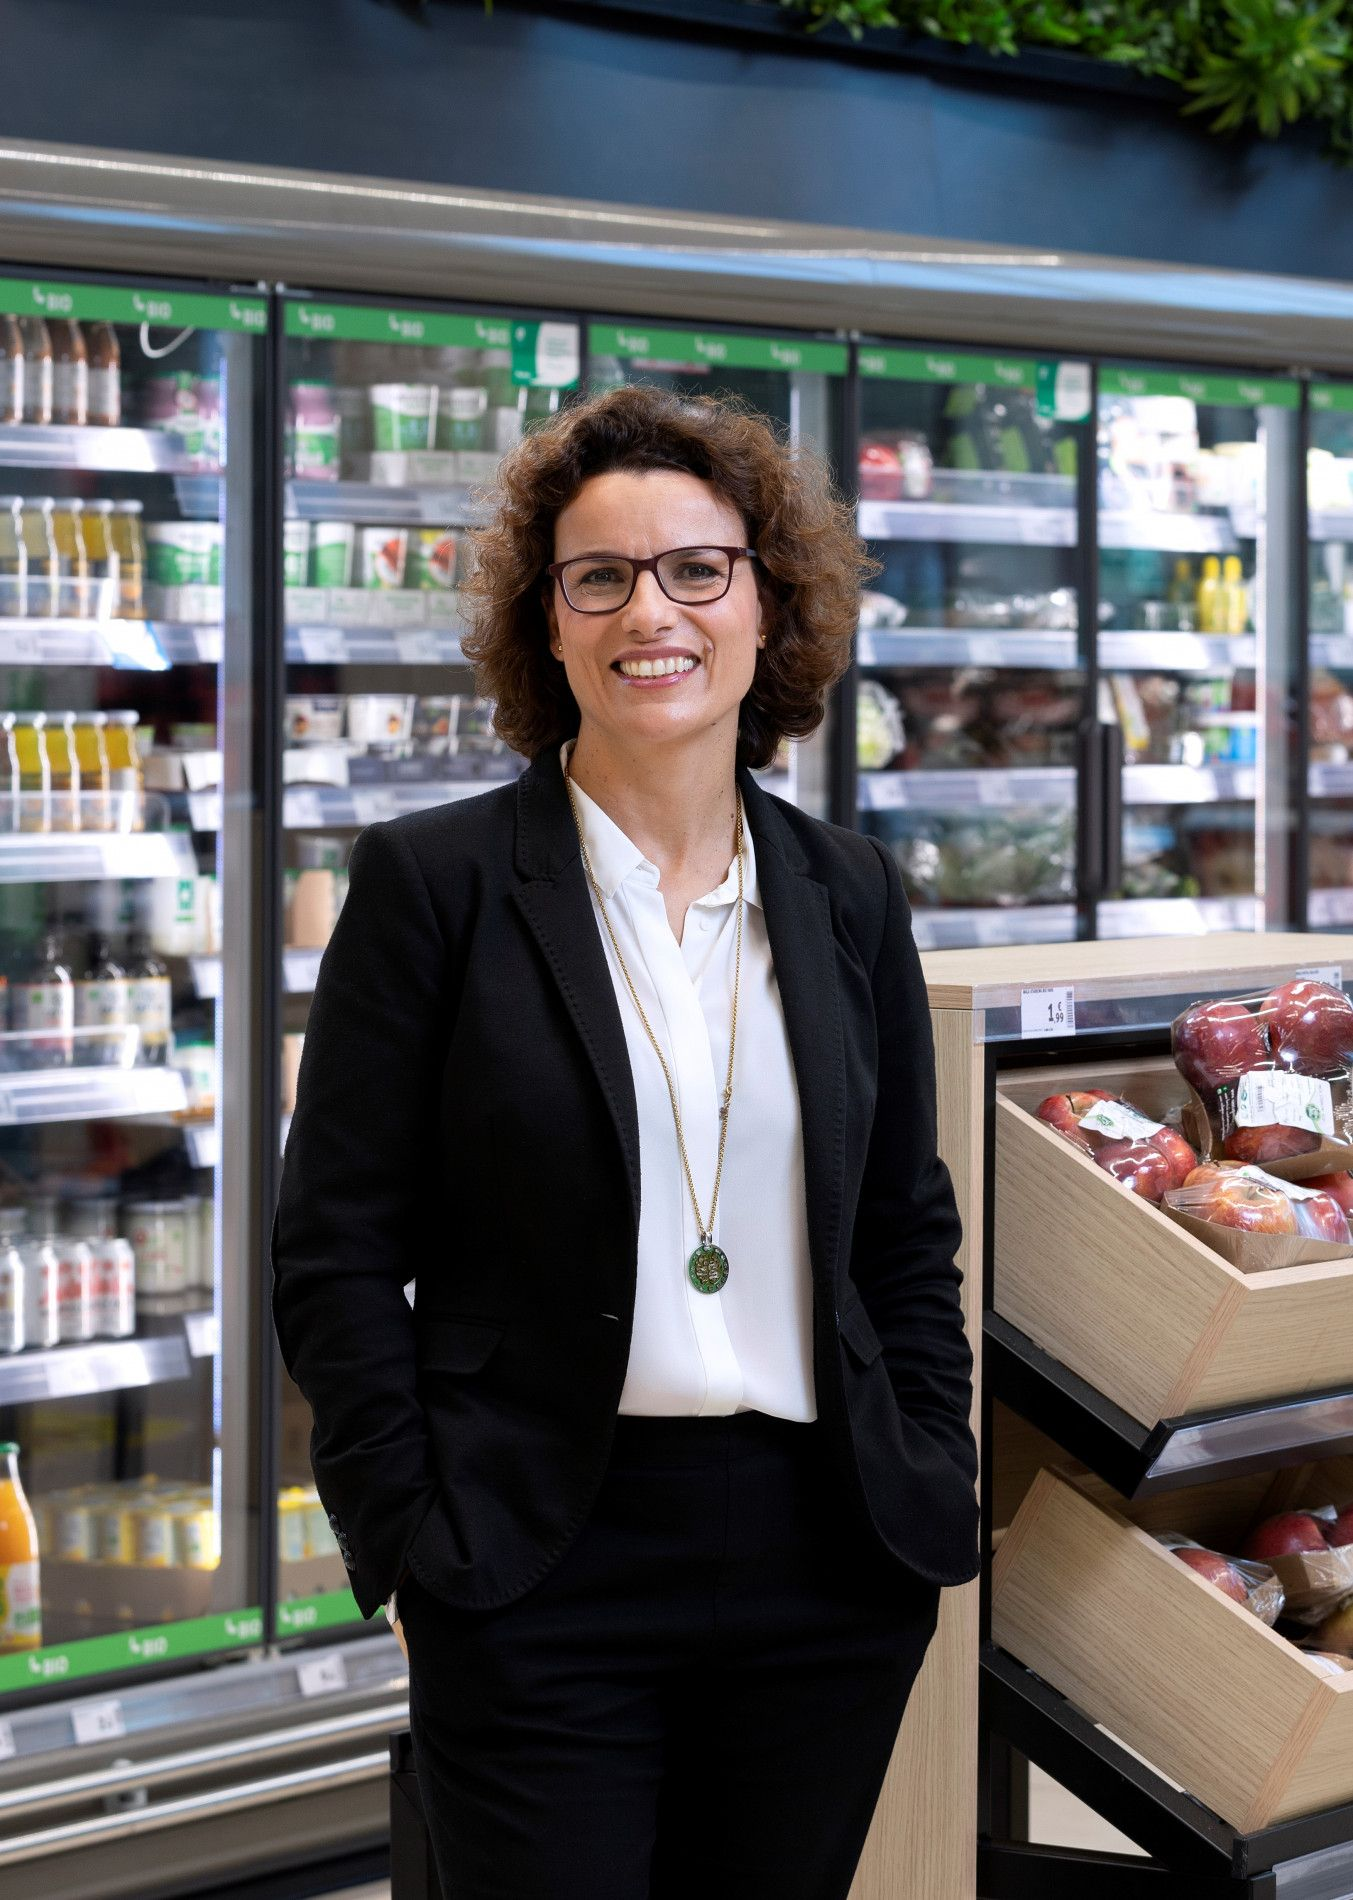 Filipa Rebelo Pinto